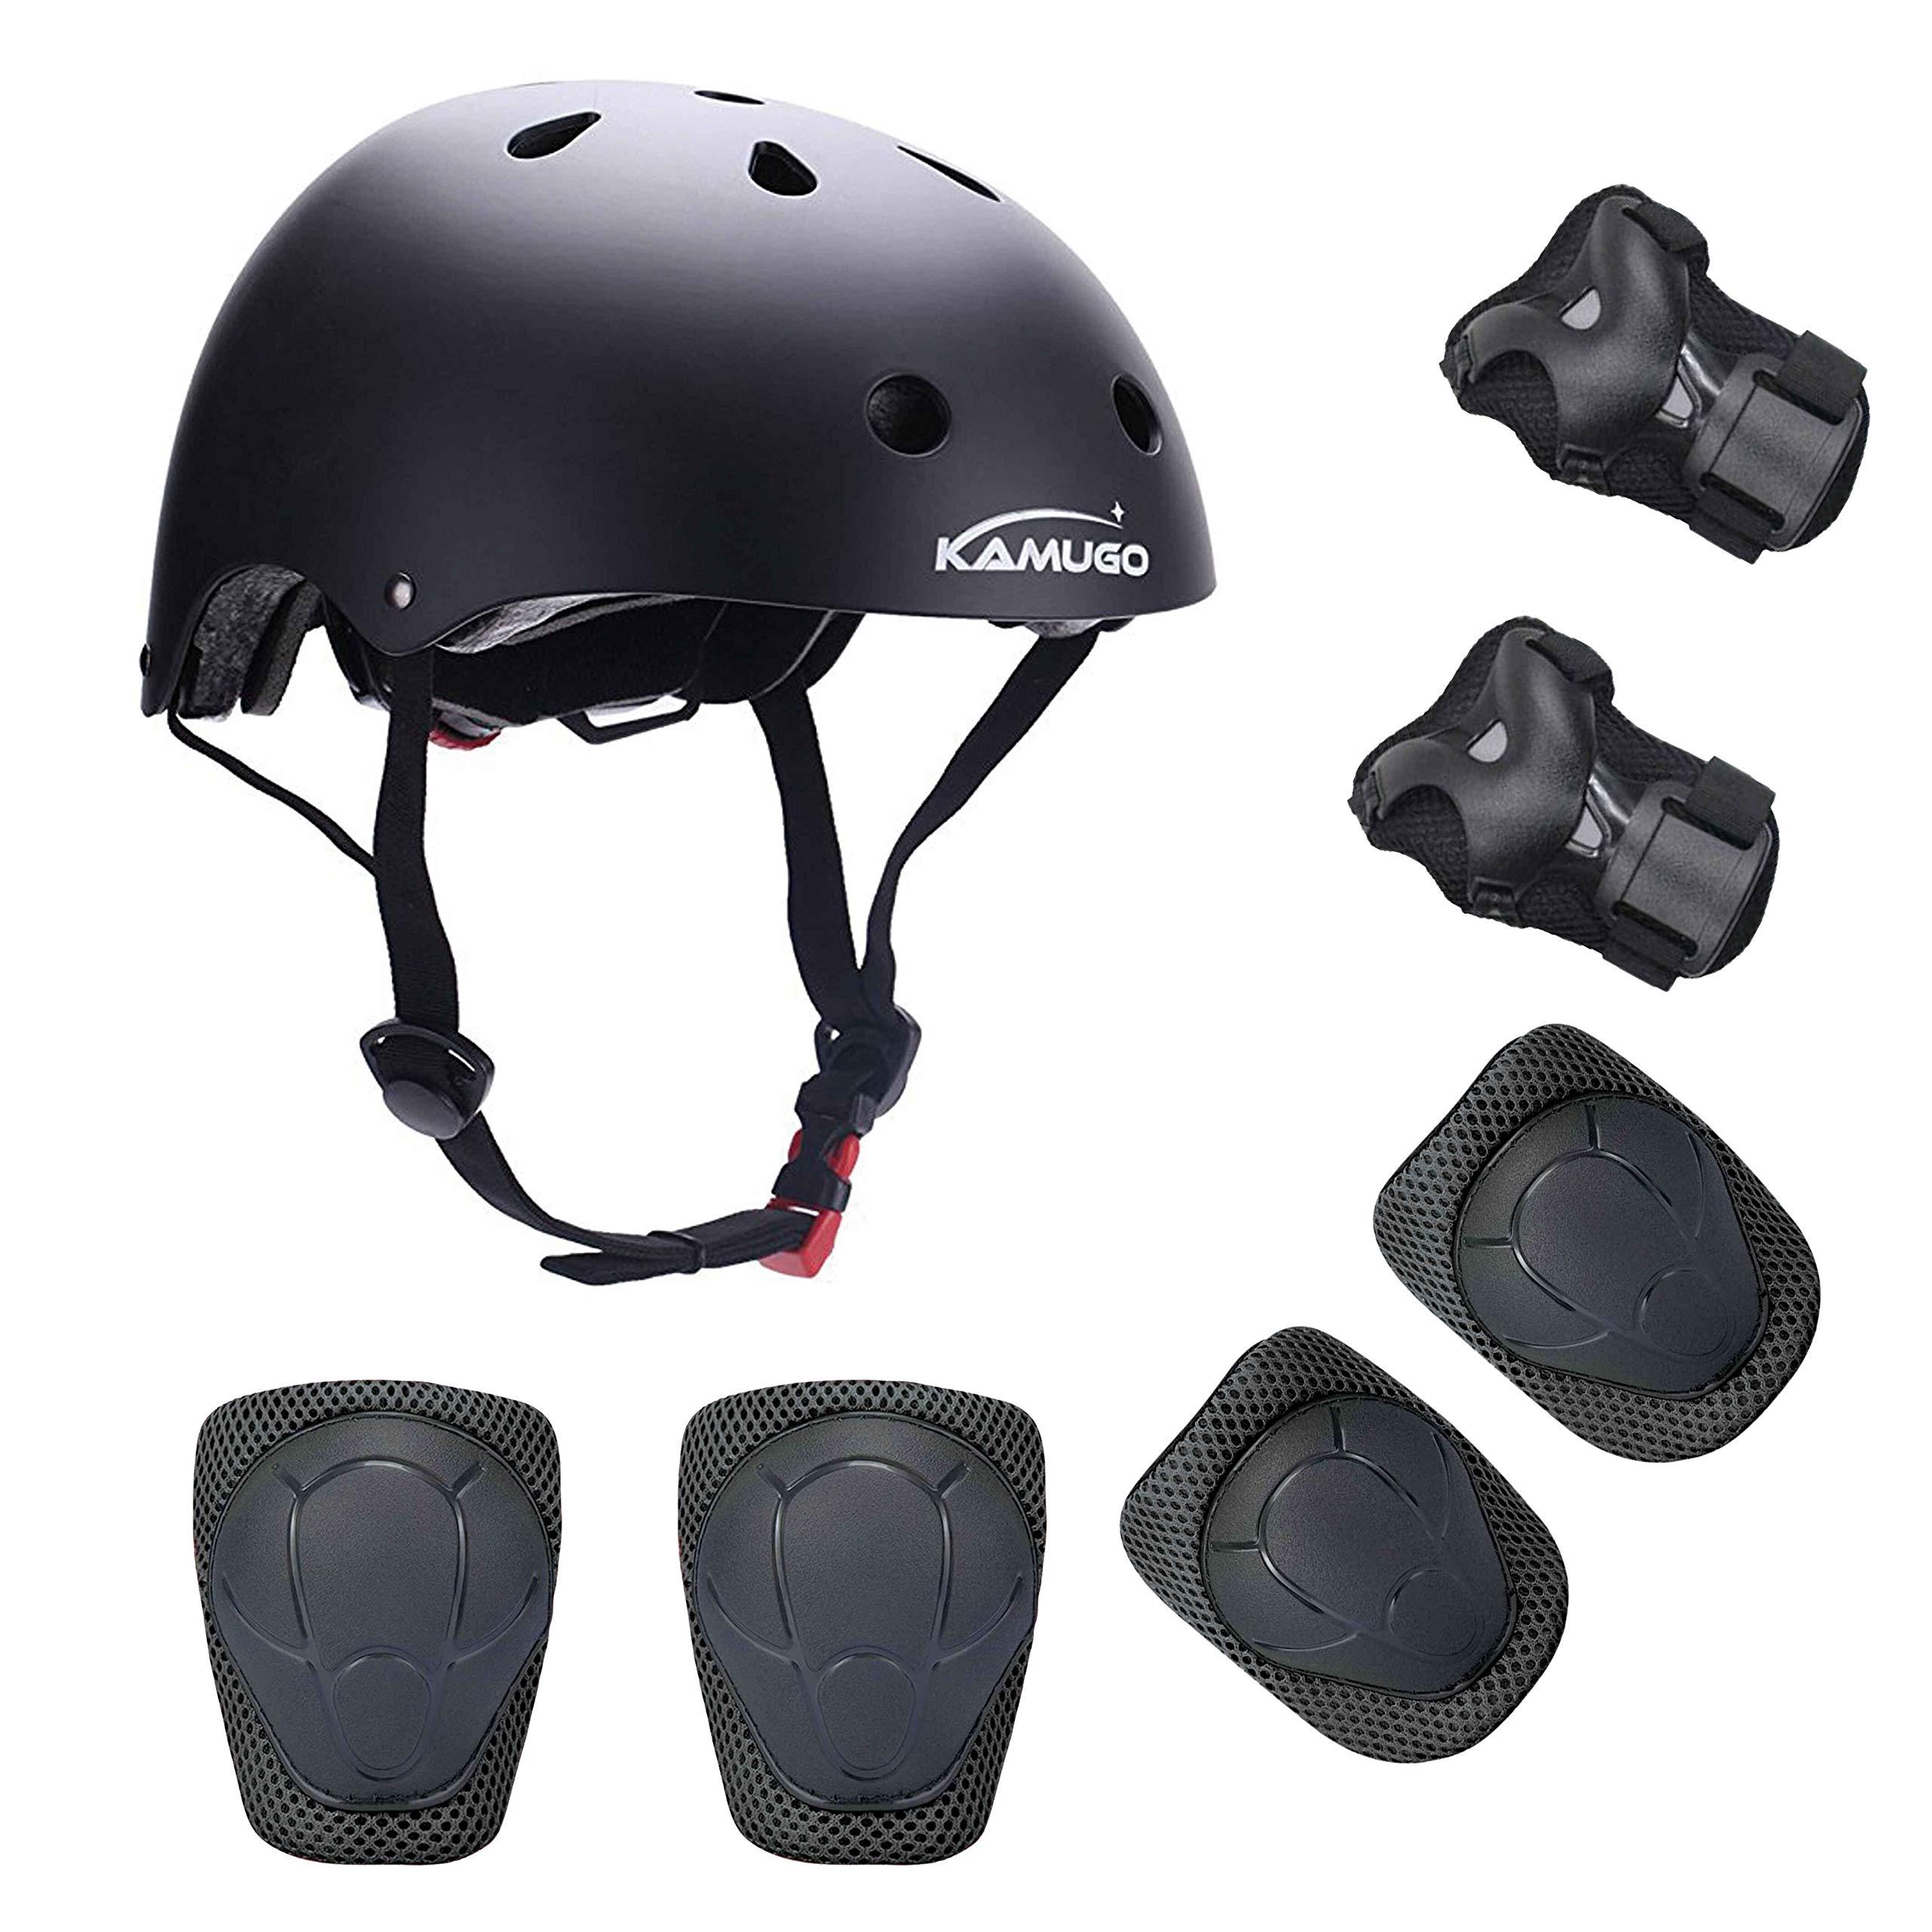 KAMUGO Kids Helmet Knee Pads for Kids 3-8 Years Toddler Helmet, Kids Bike Skateboard Helmet Youth Hoverboard Cycling Scooter Rollerblading Protective Gear Adjustable Helmets for Kids